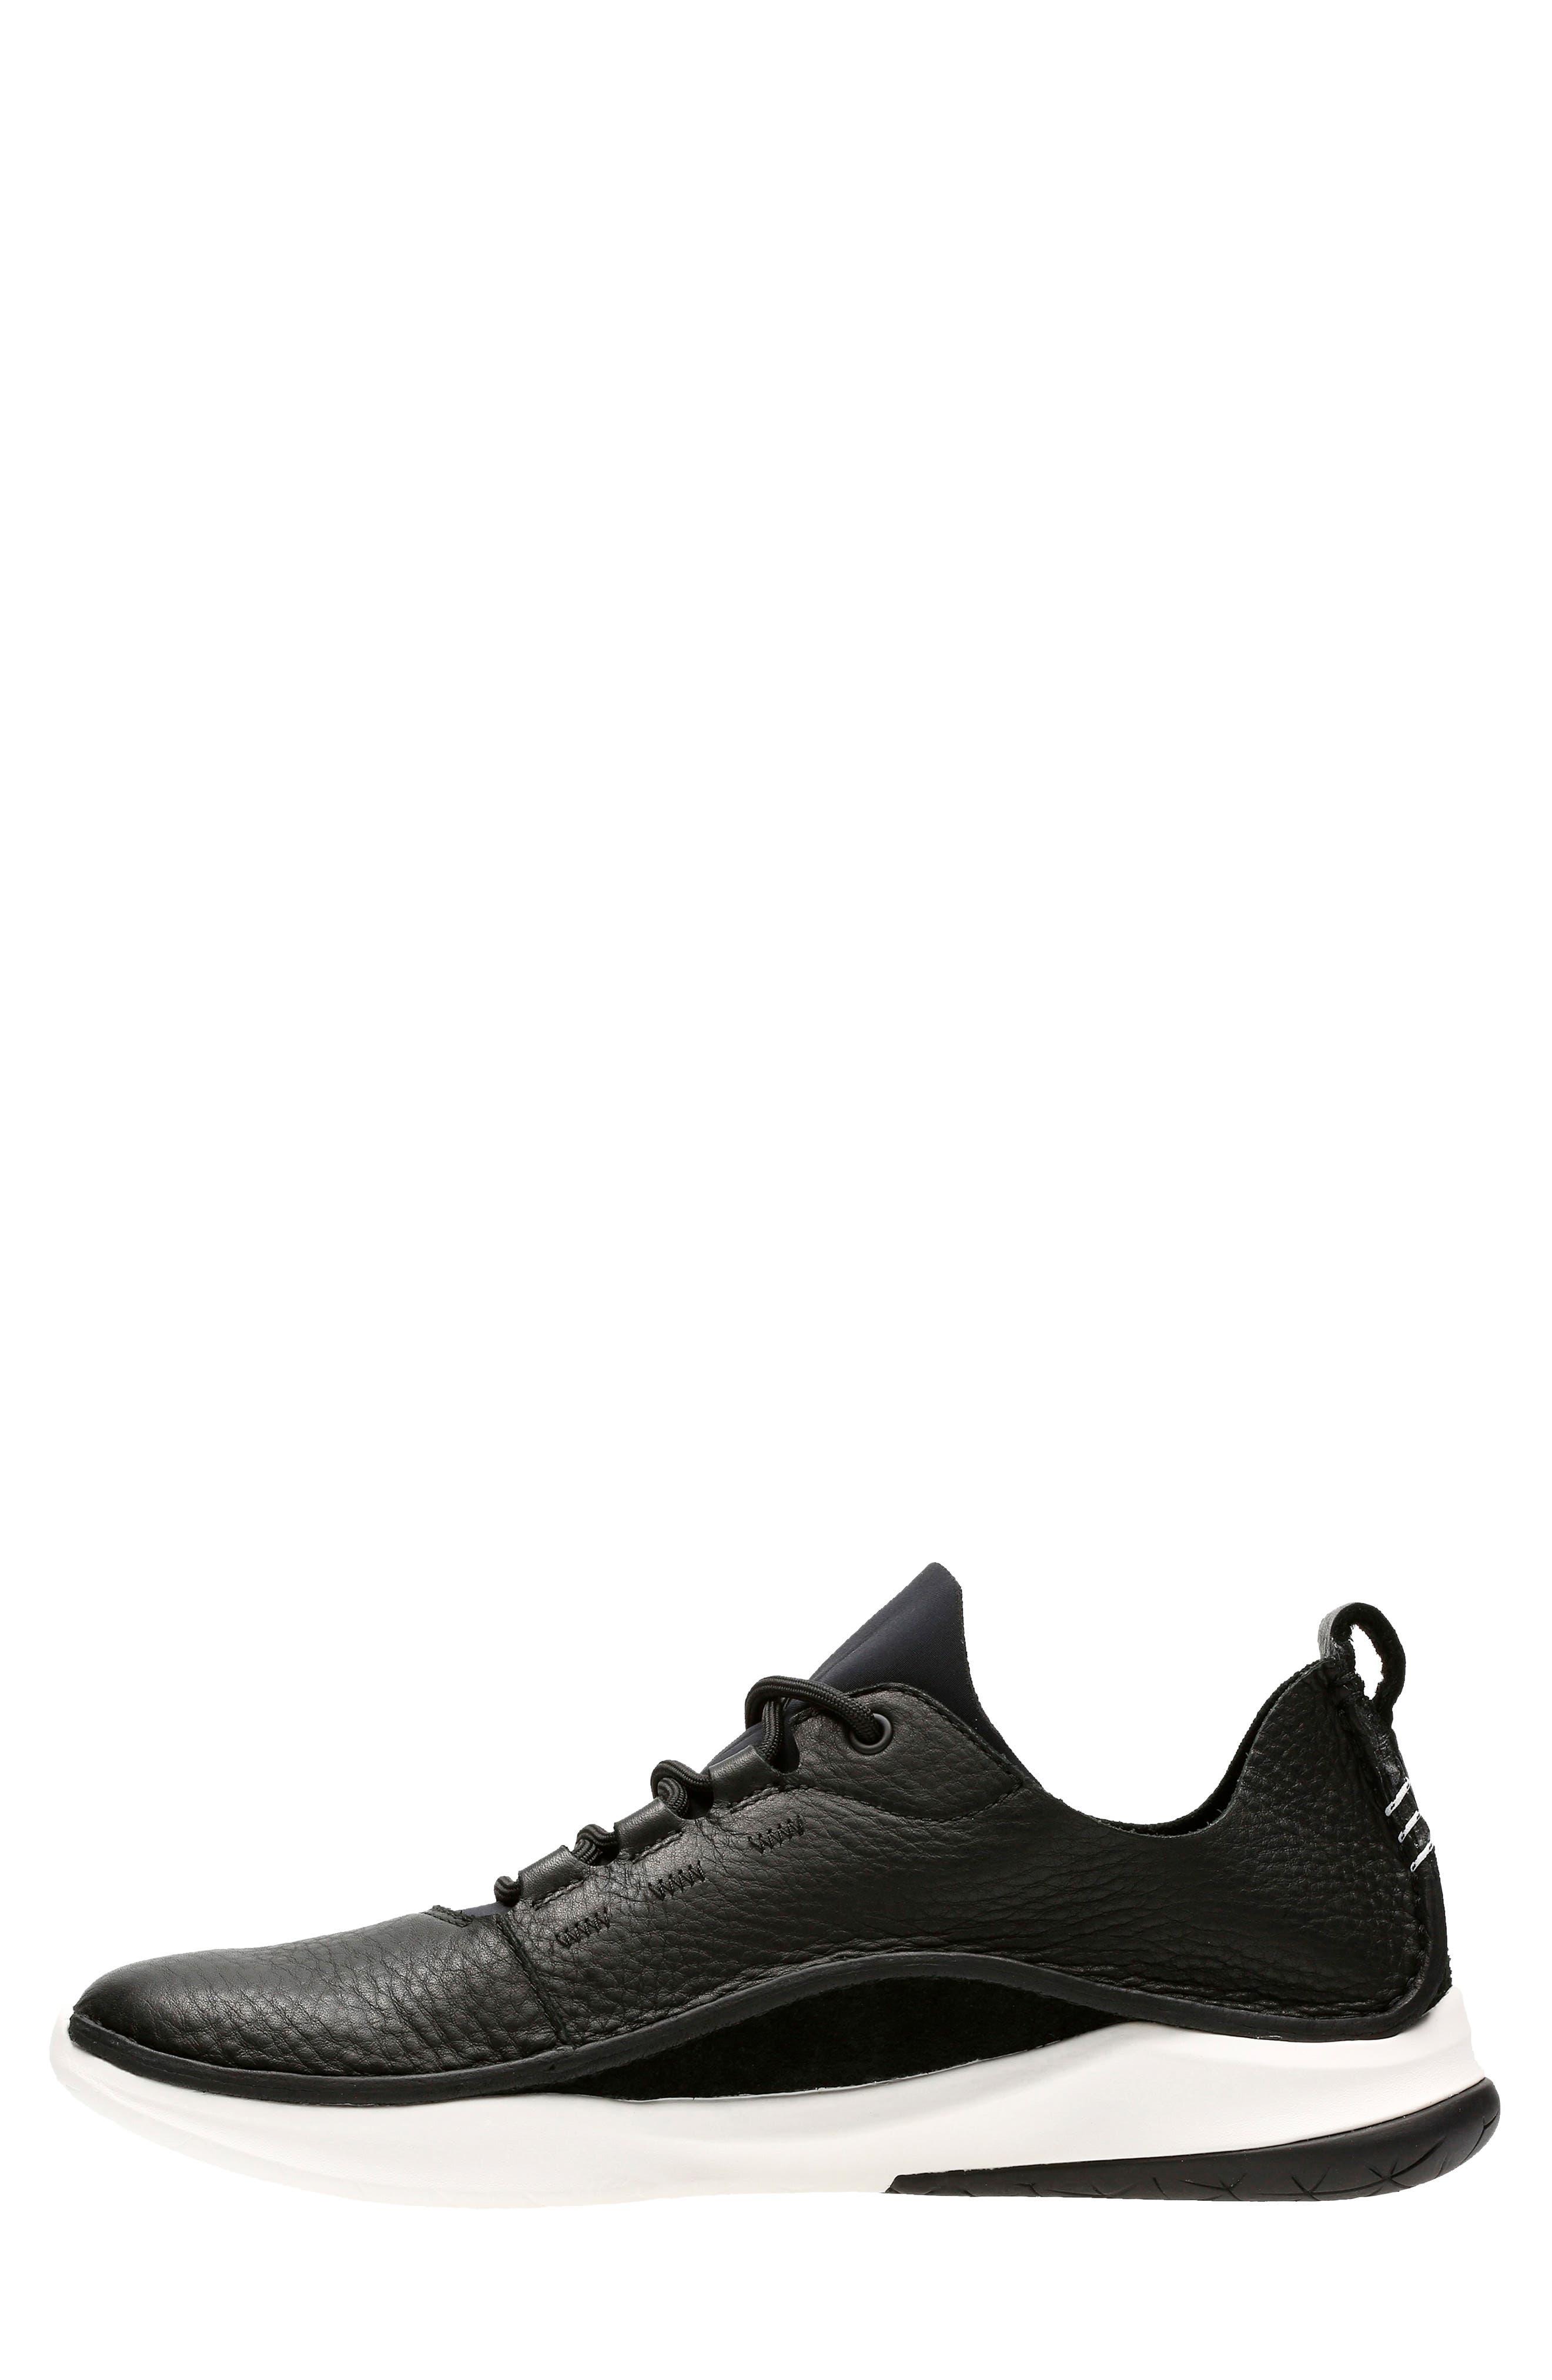 Privolution Lo Sneaker,                             Alternate thumbnail 7, color,                             BLACKOUT